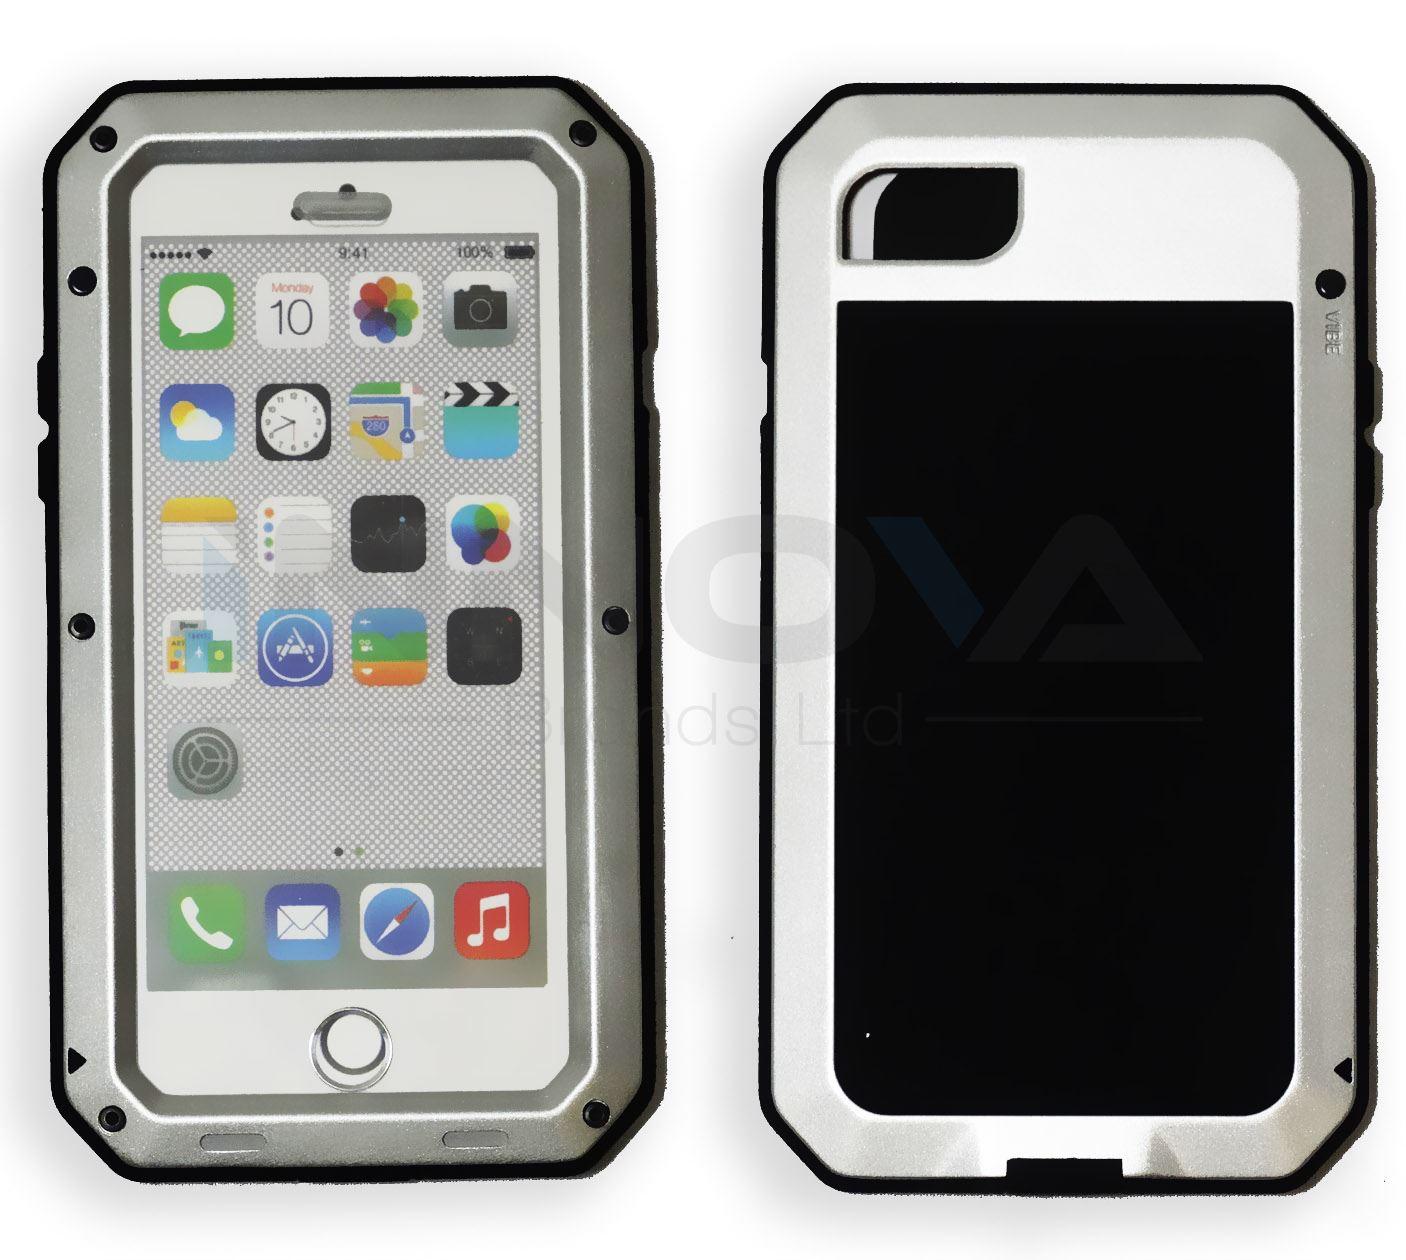 Heavy-Duty-Armor-Shockproof-Tough-Hybrid-Metal-Anti-Shock-Proof-Case-iPhone-New